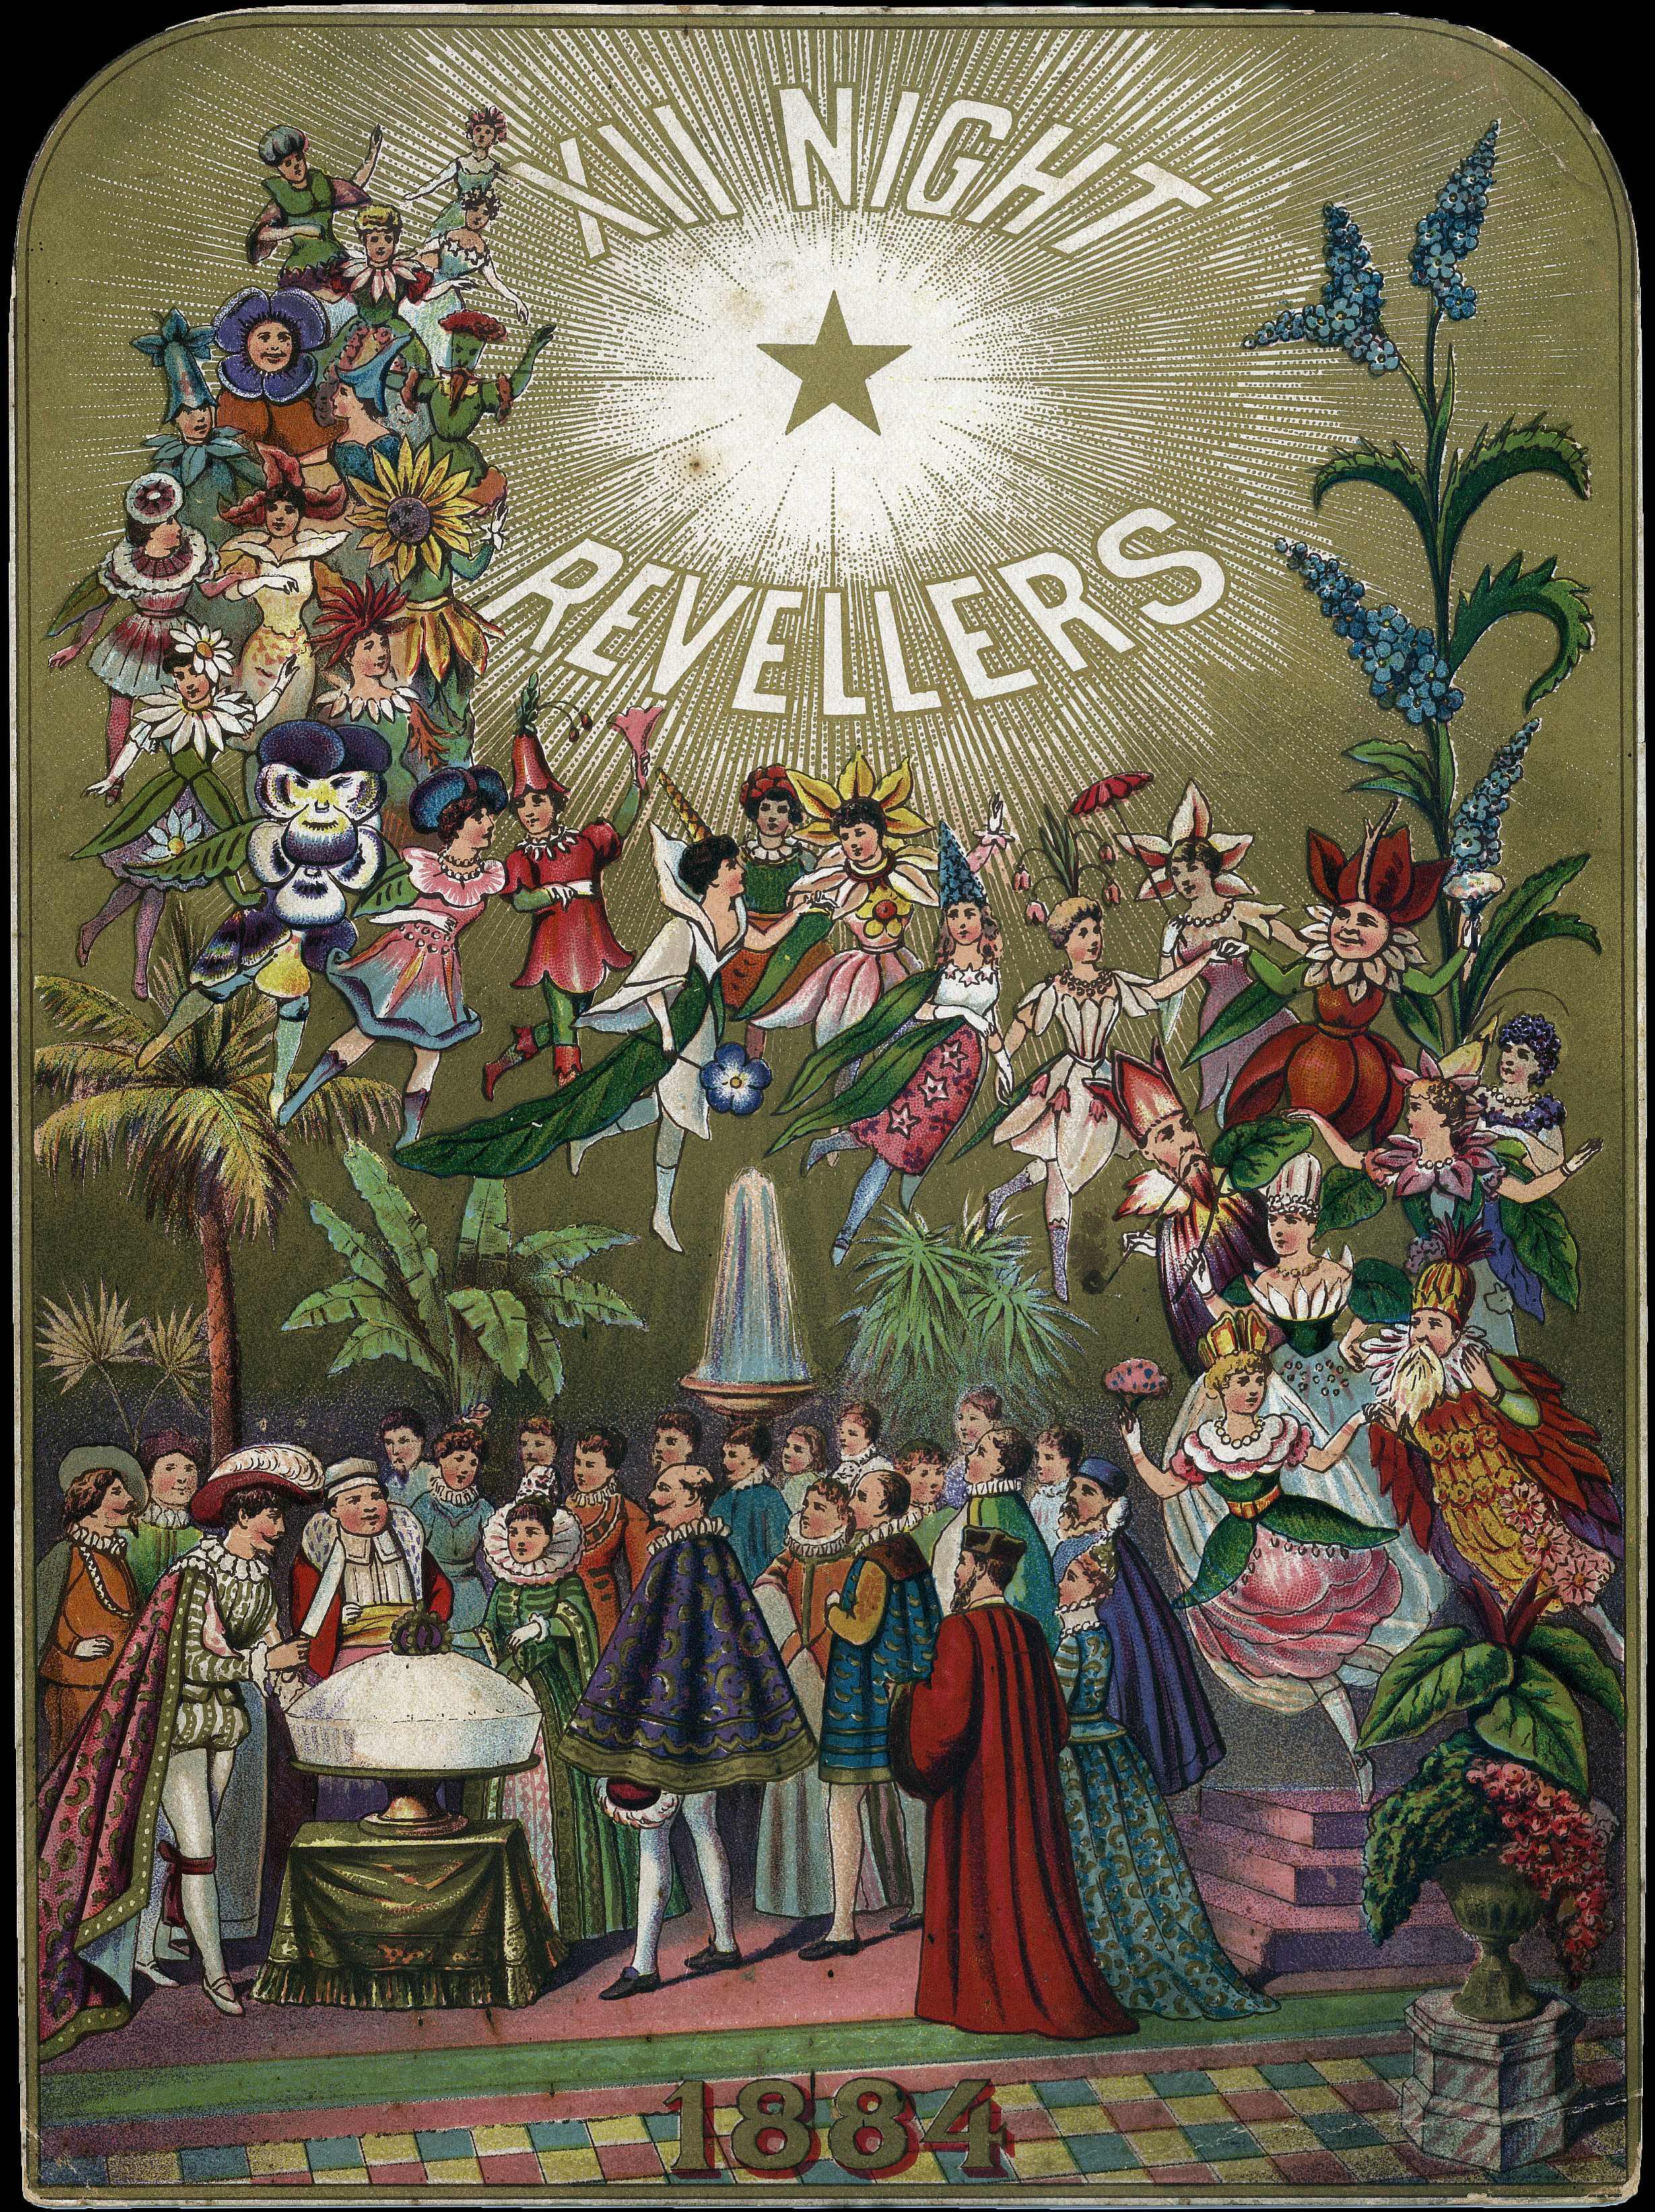 File12th Night Revelers Carnival 1884 NOLAjpg